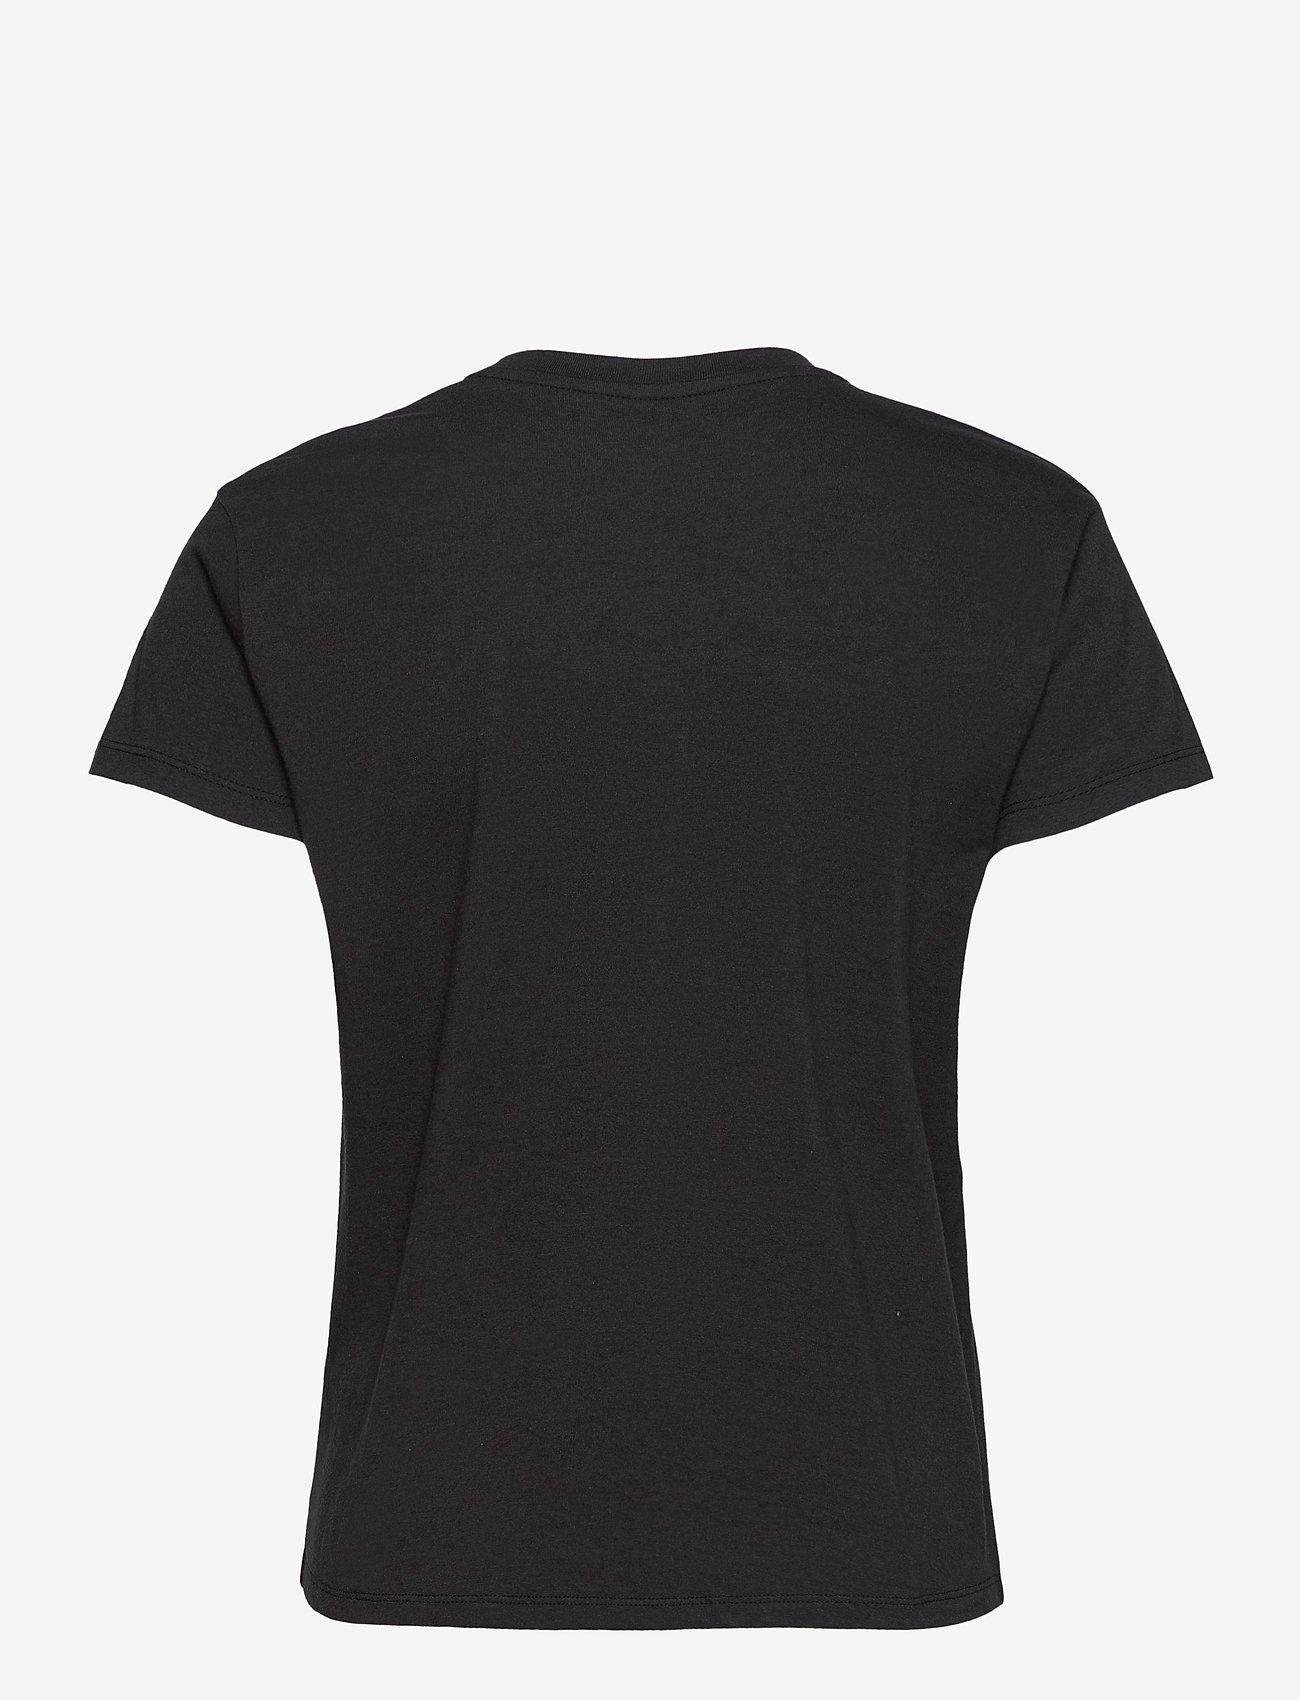 Zadig & Voltaire - ZOE SMALL HEART ICONICS T-SHIRT - t-shirts - black - 2